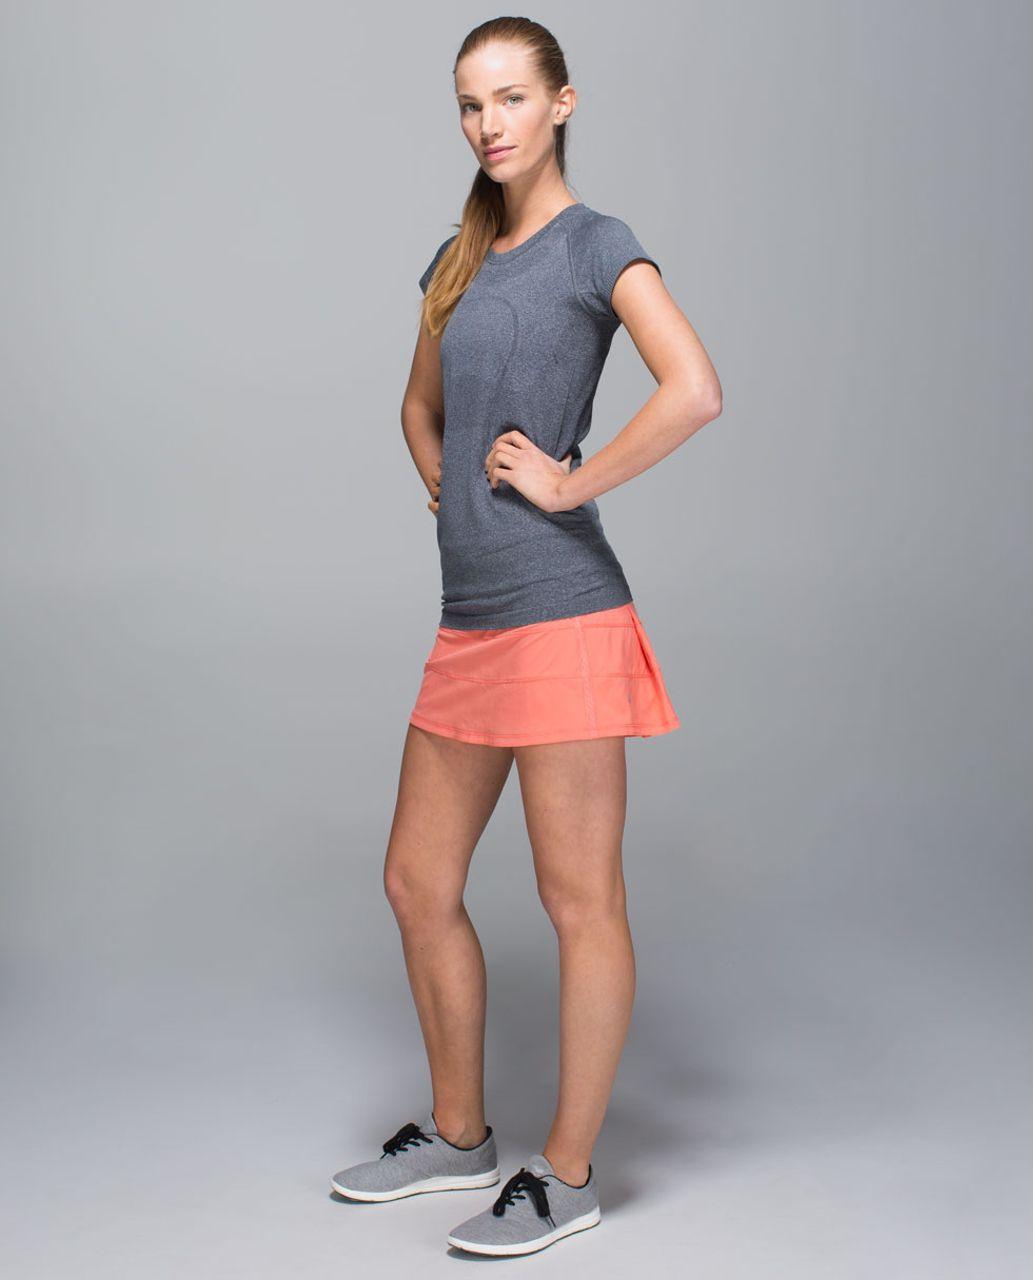 Lululemon Pace Rival Skirt II *4-way Stretch (Regular) - Plum Peach / Blushed Illusion Multi